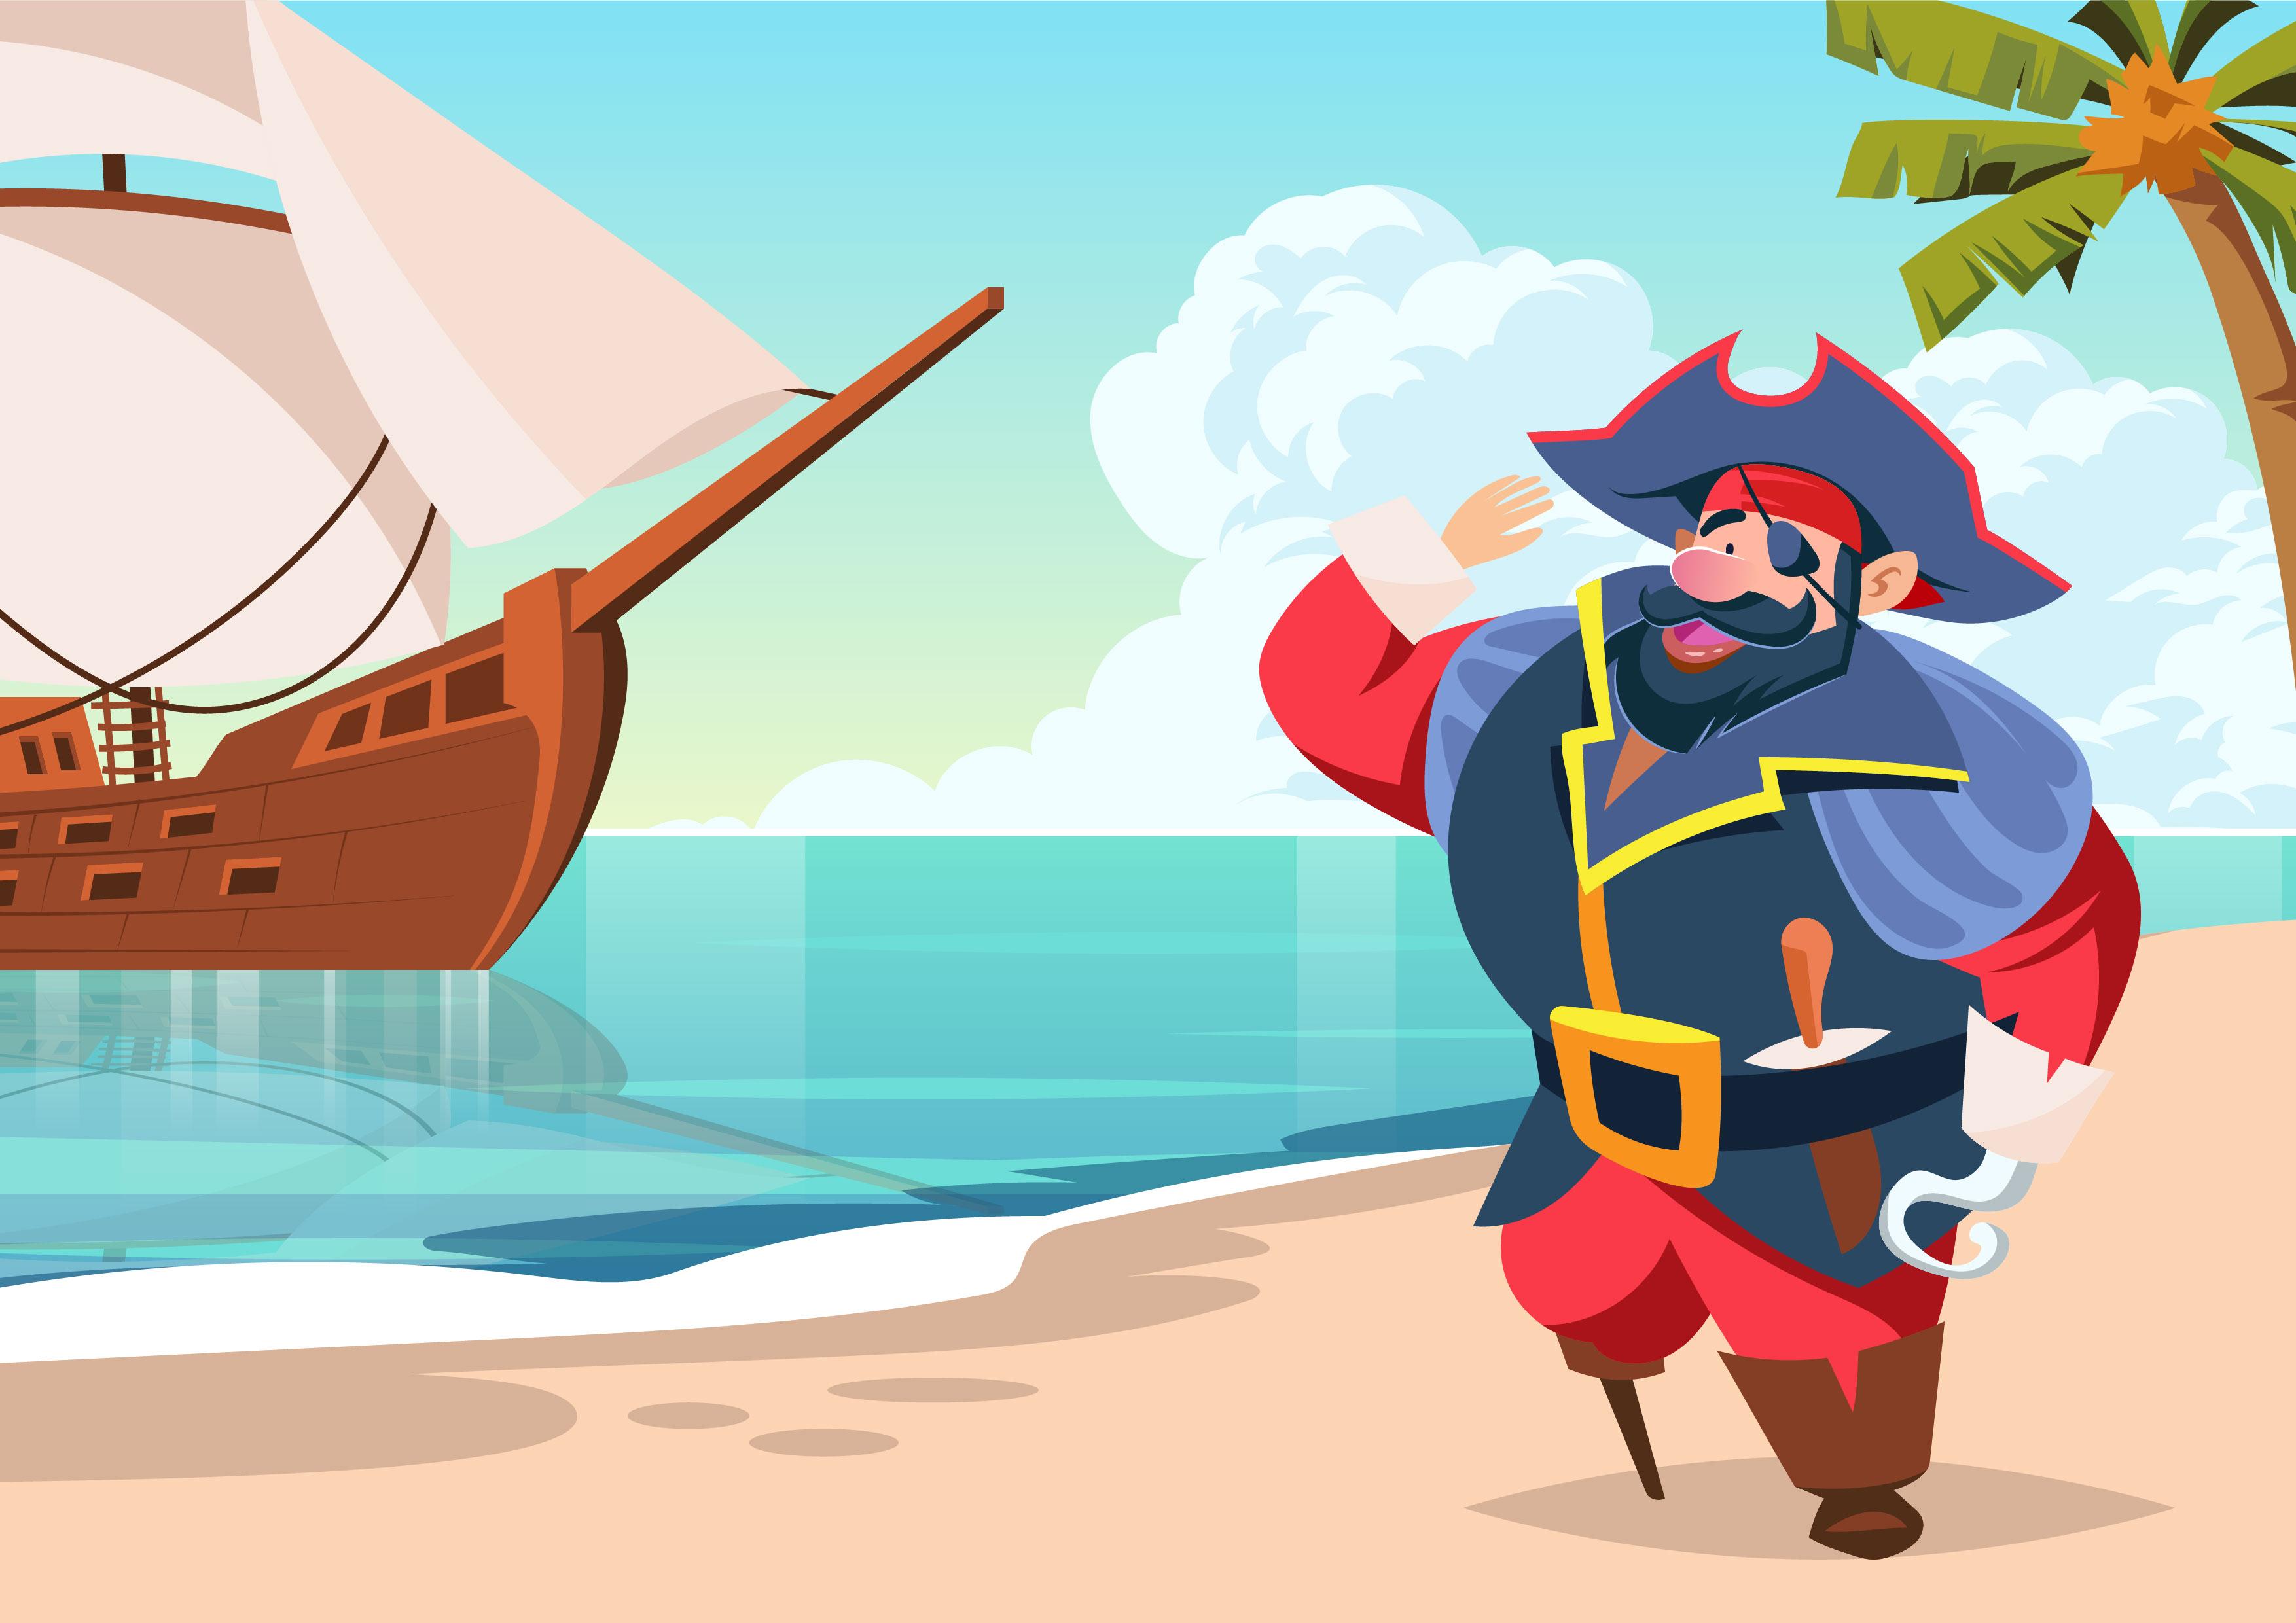 рисунок пираты на острове звук